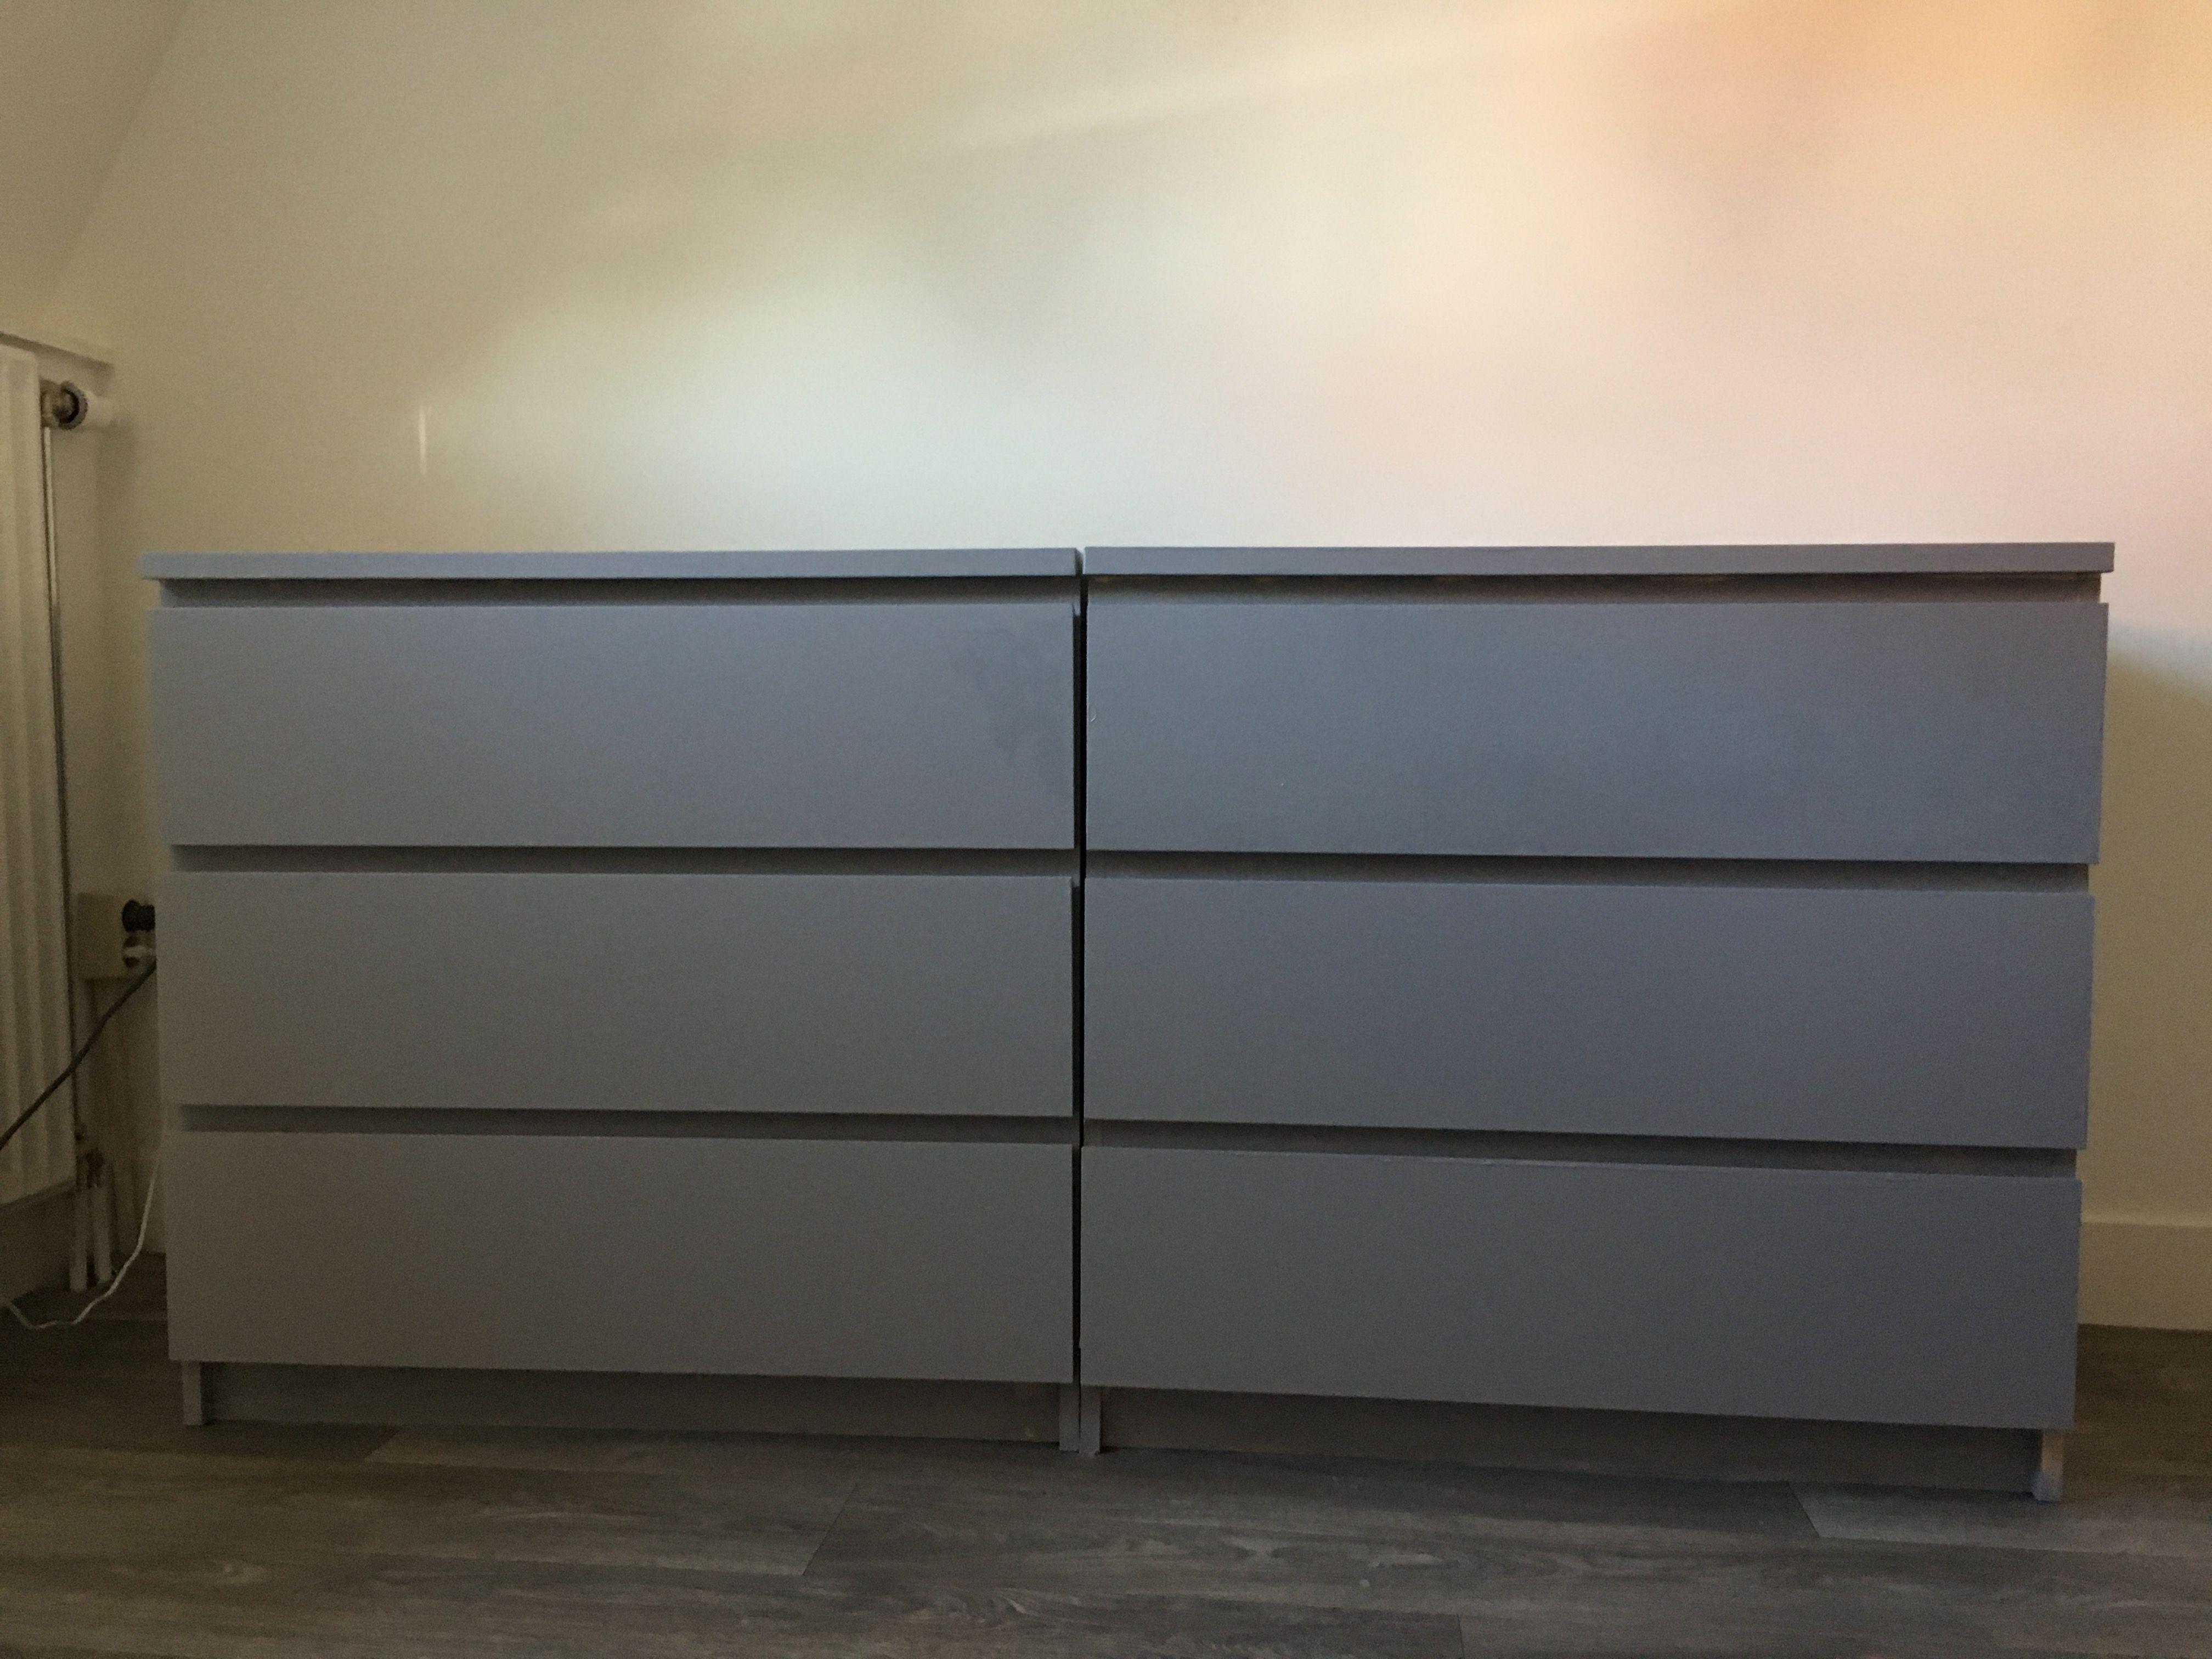 Kuche Ikea Malm Glasplatte Kuche Ikea